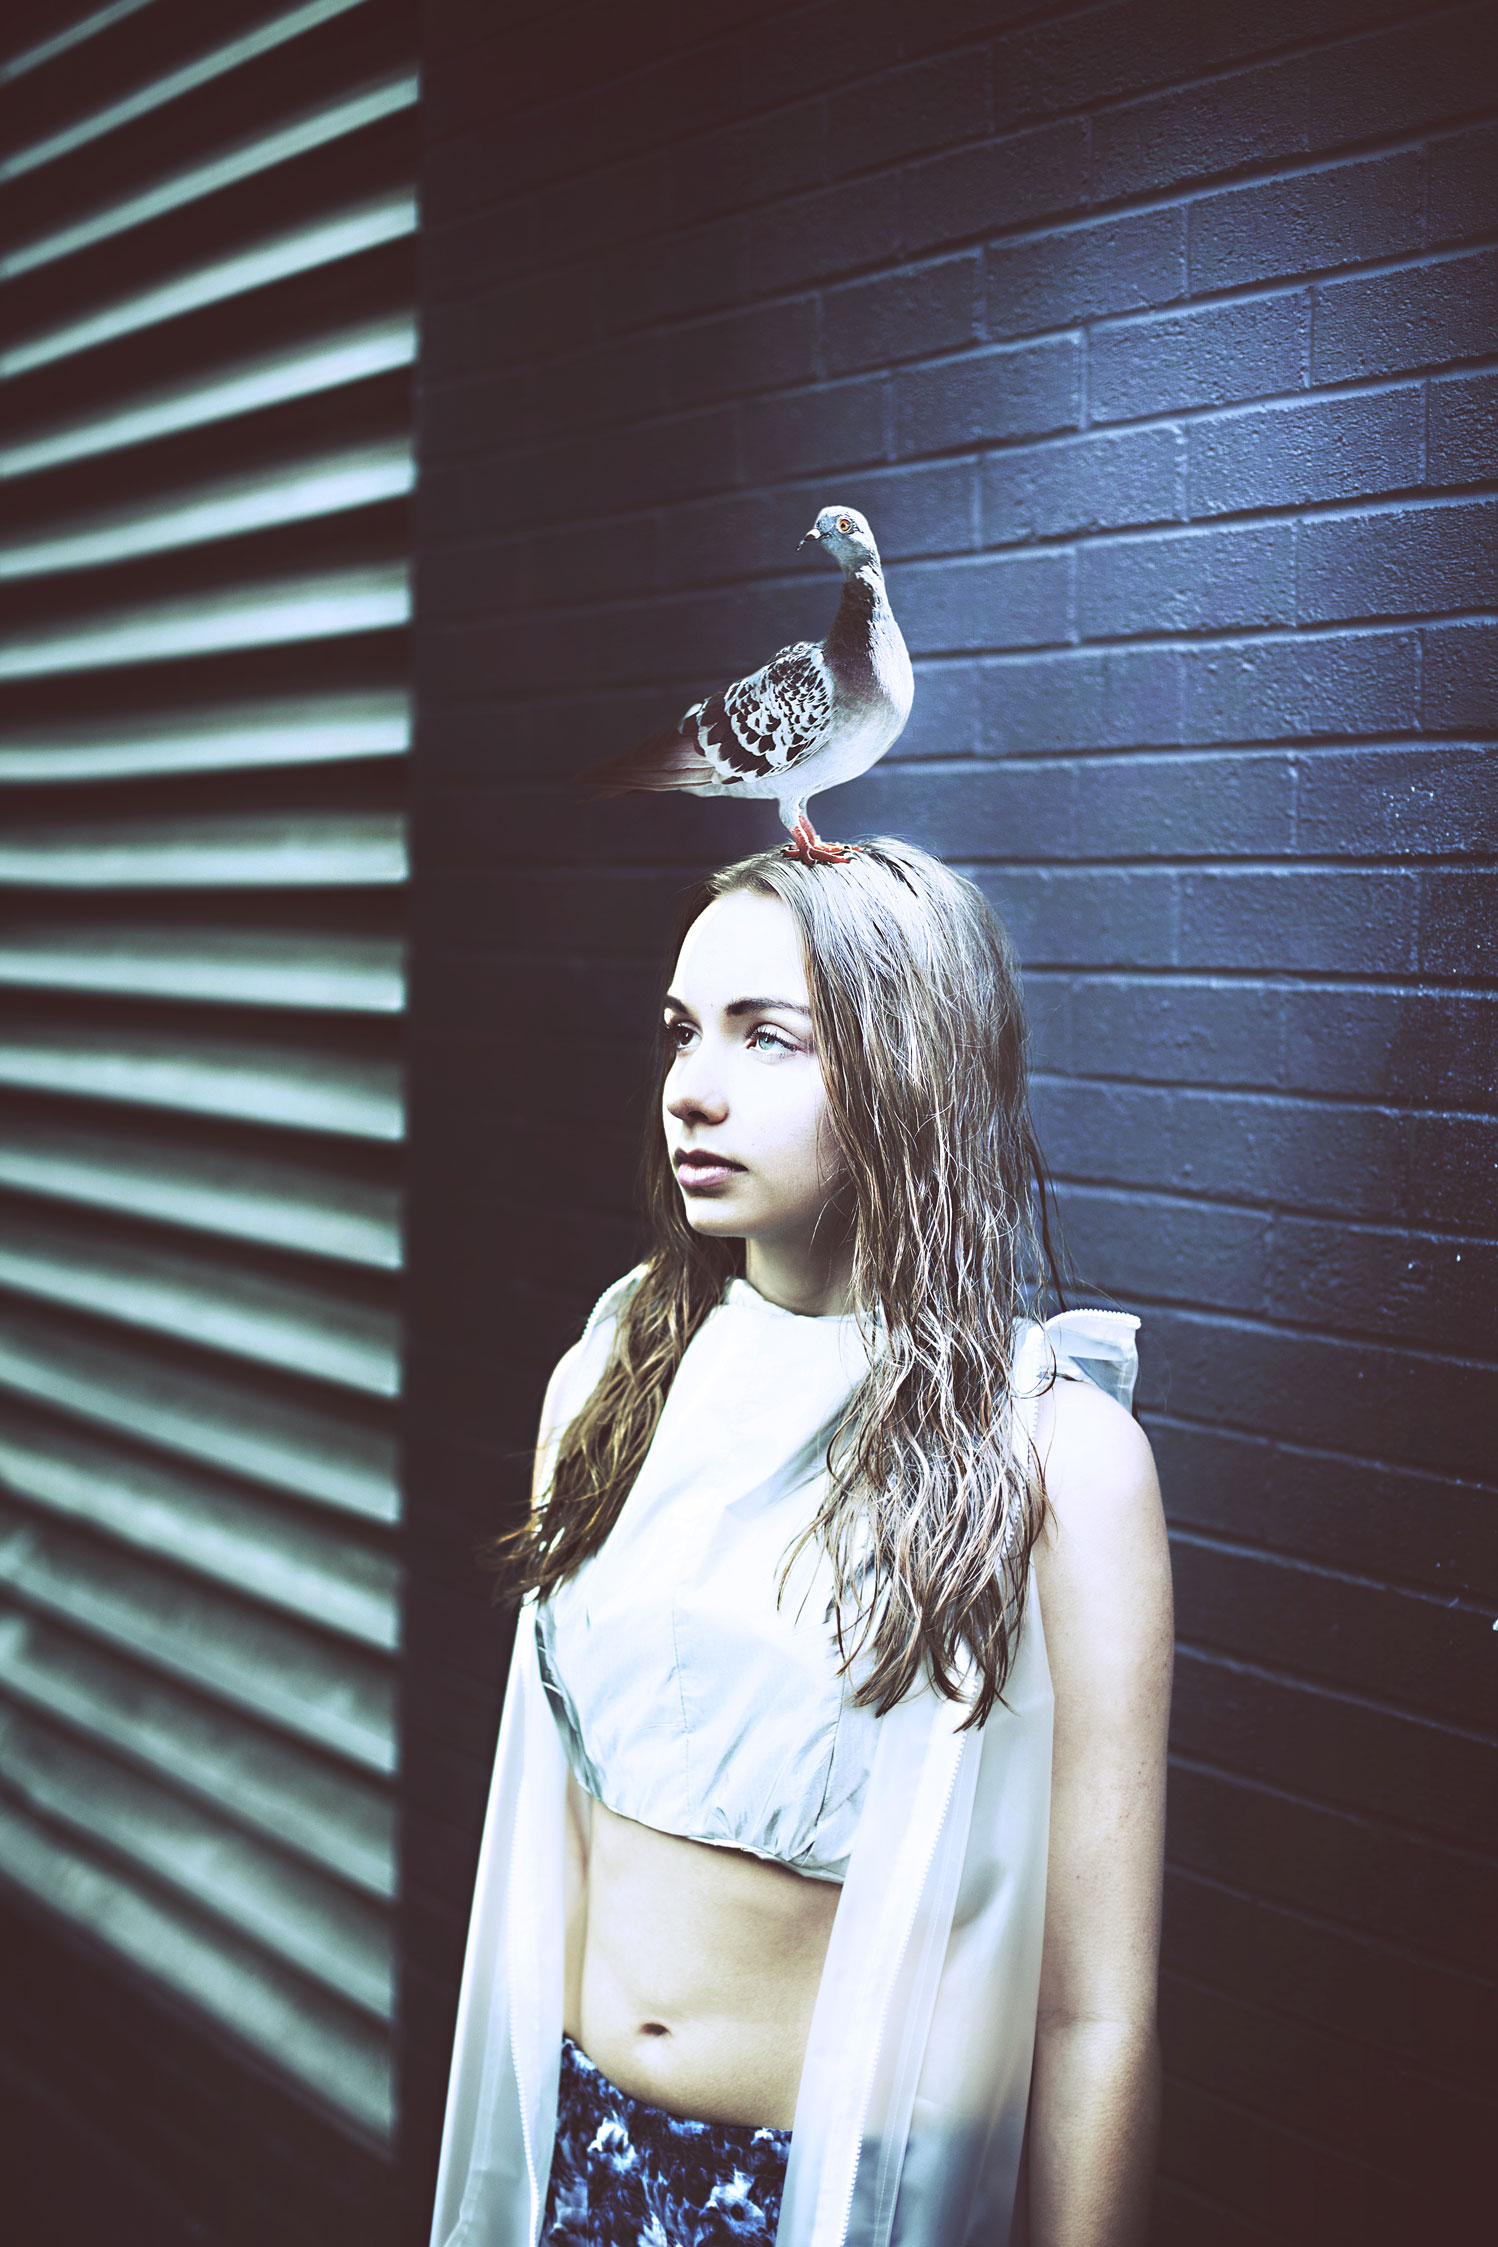 pigeon-head-copy-2.jpg